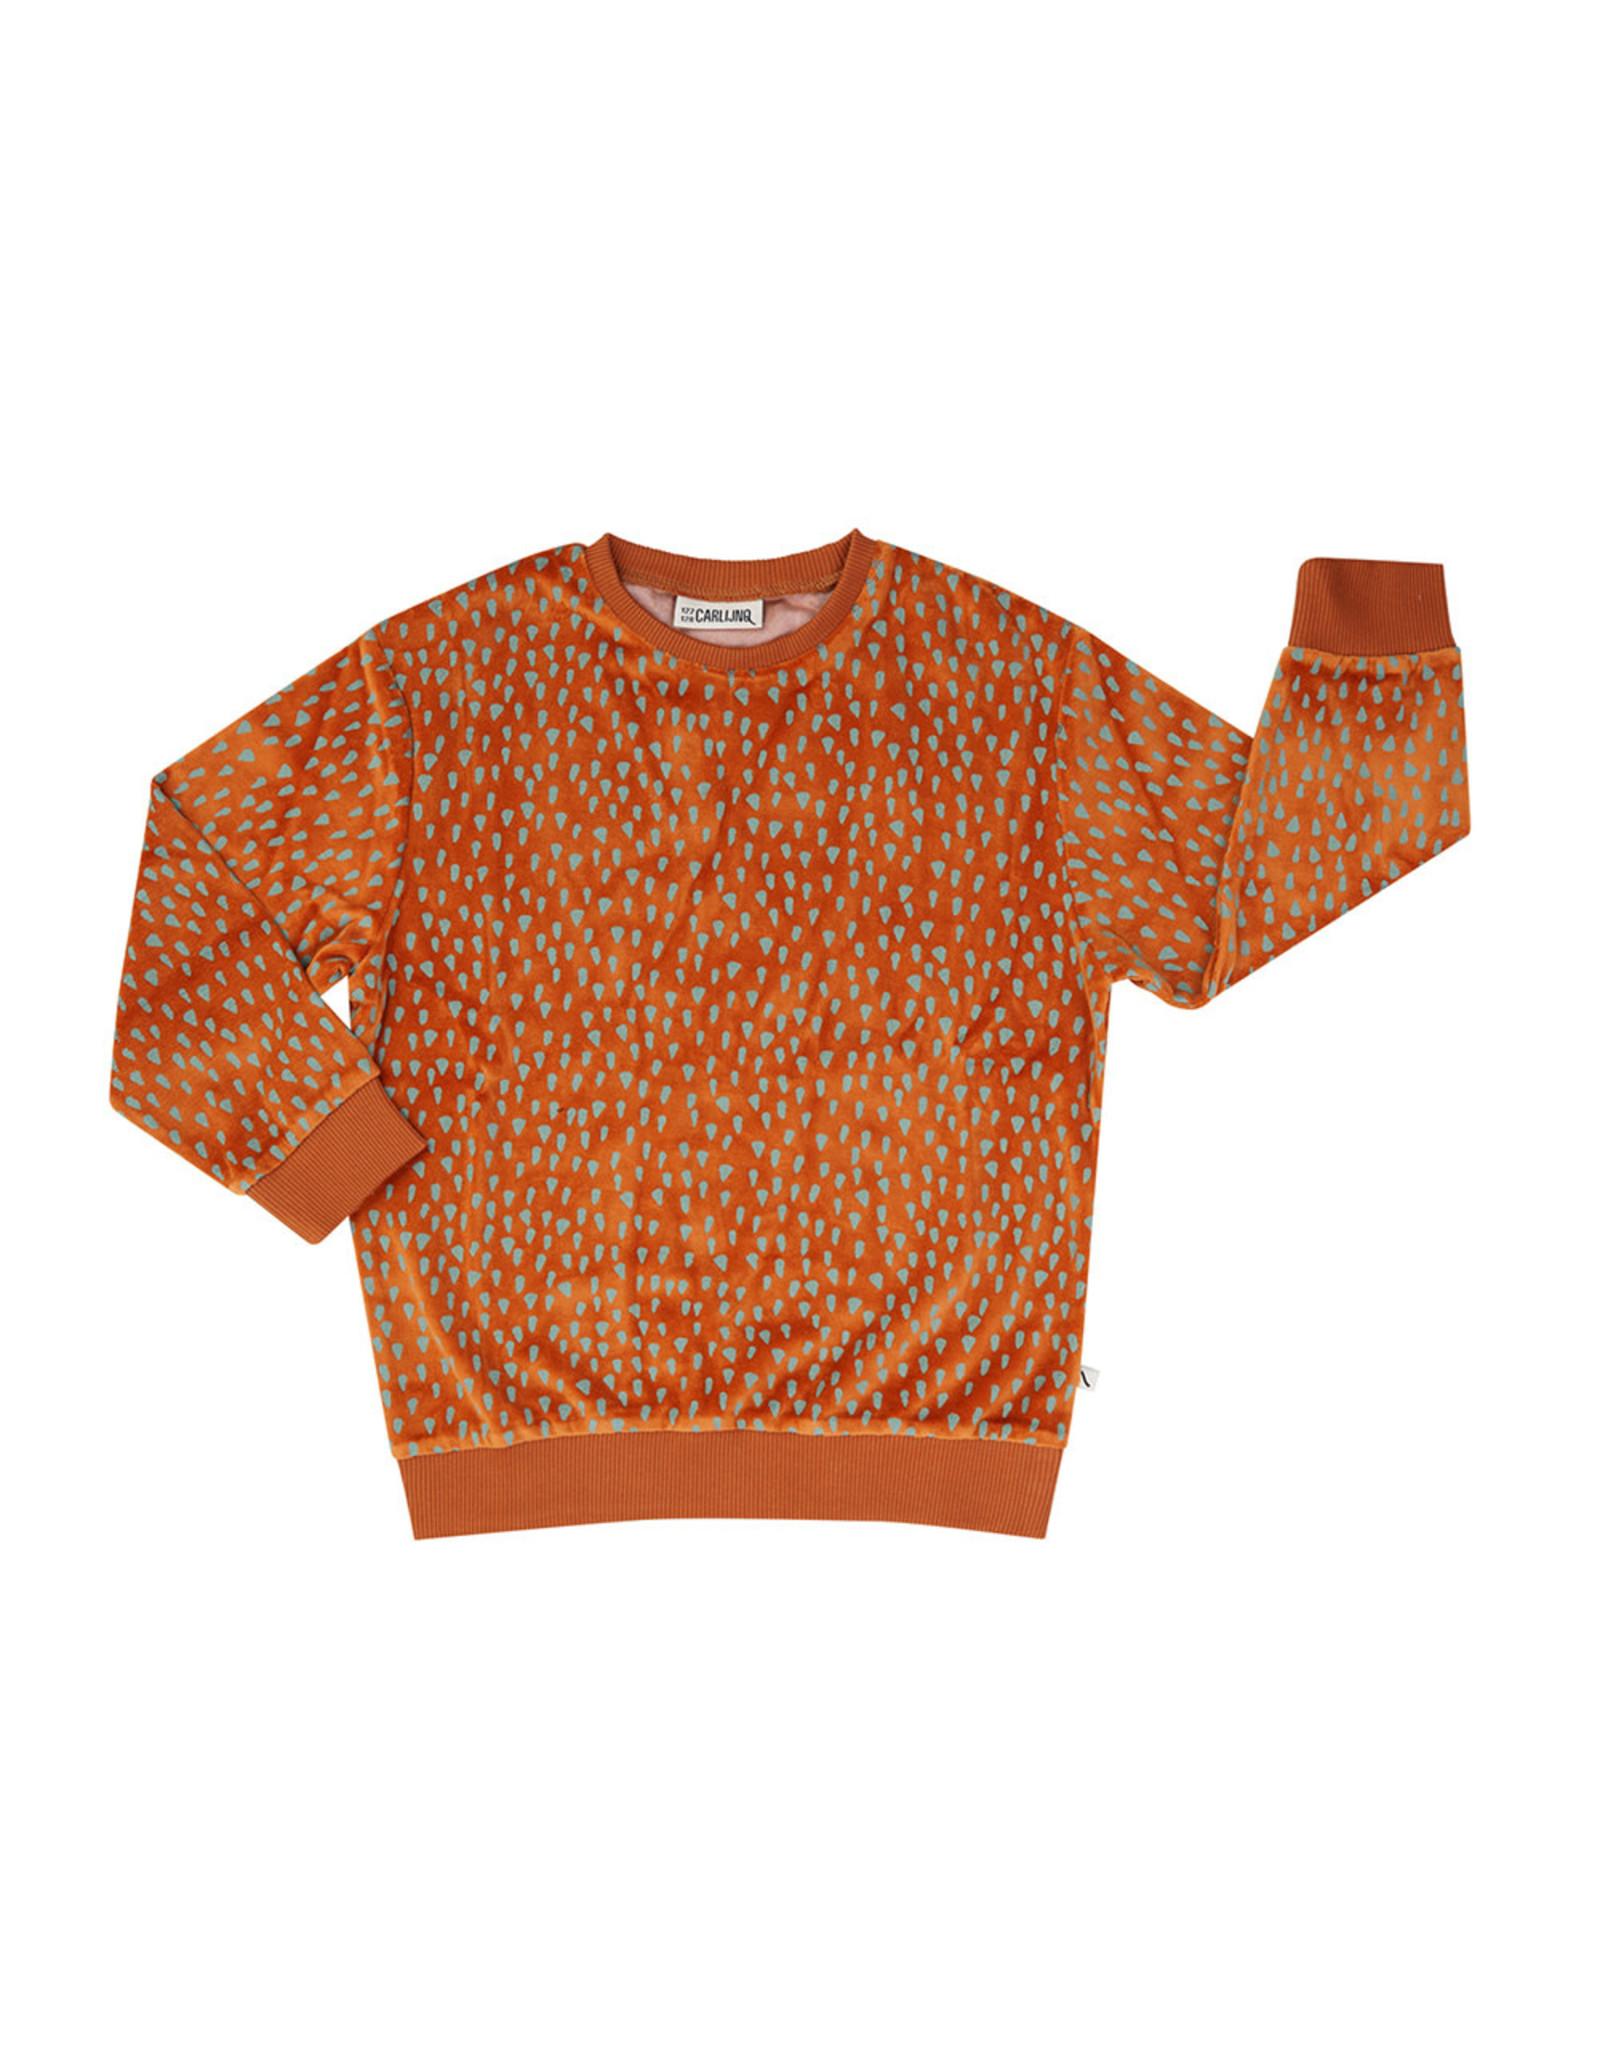 Carlijn Q Carlijn Q Mountain Air Sparkles - Velours Sweater